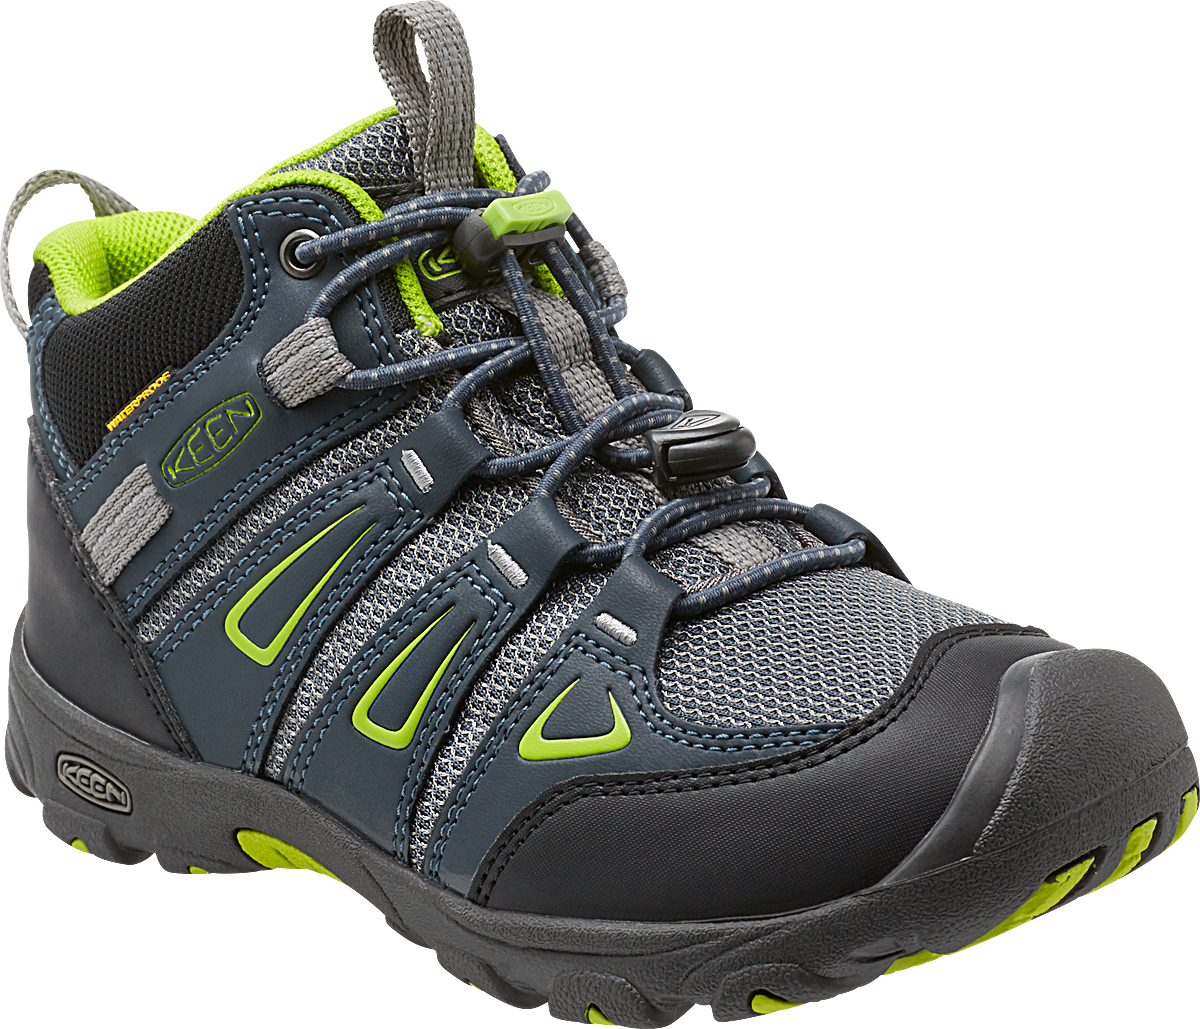 e80c6e9e3c4 Keen Oakridge Mid Waterproof Shoes - Children to Youths | MEC